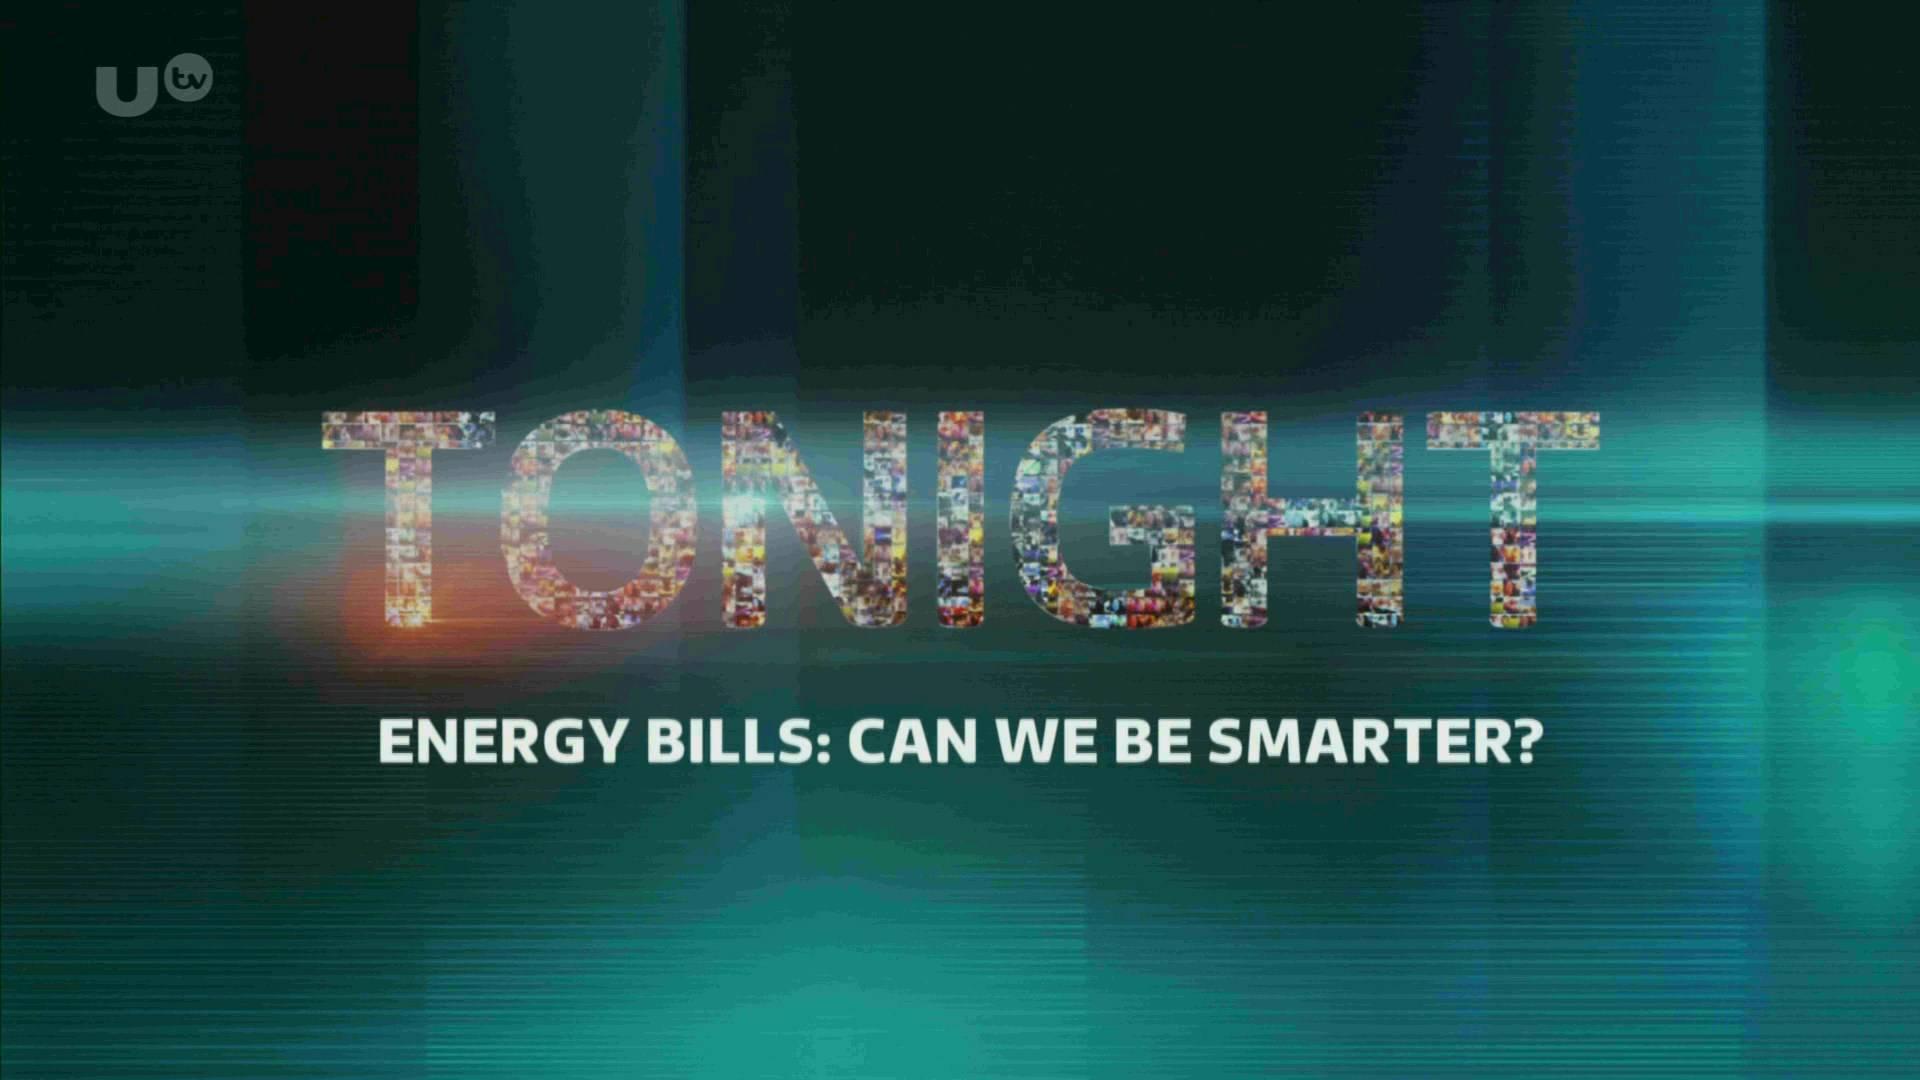 ITV Tonight - Energy Bills: Can We Be Smarter? (2017)